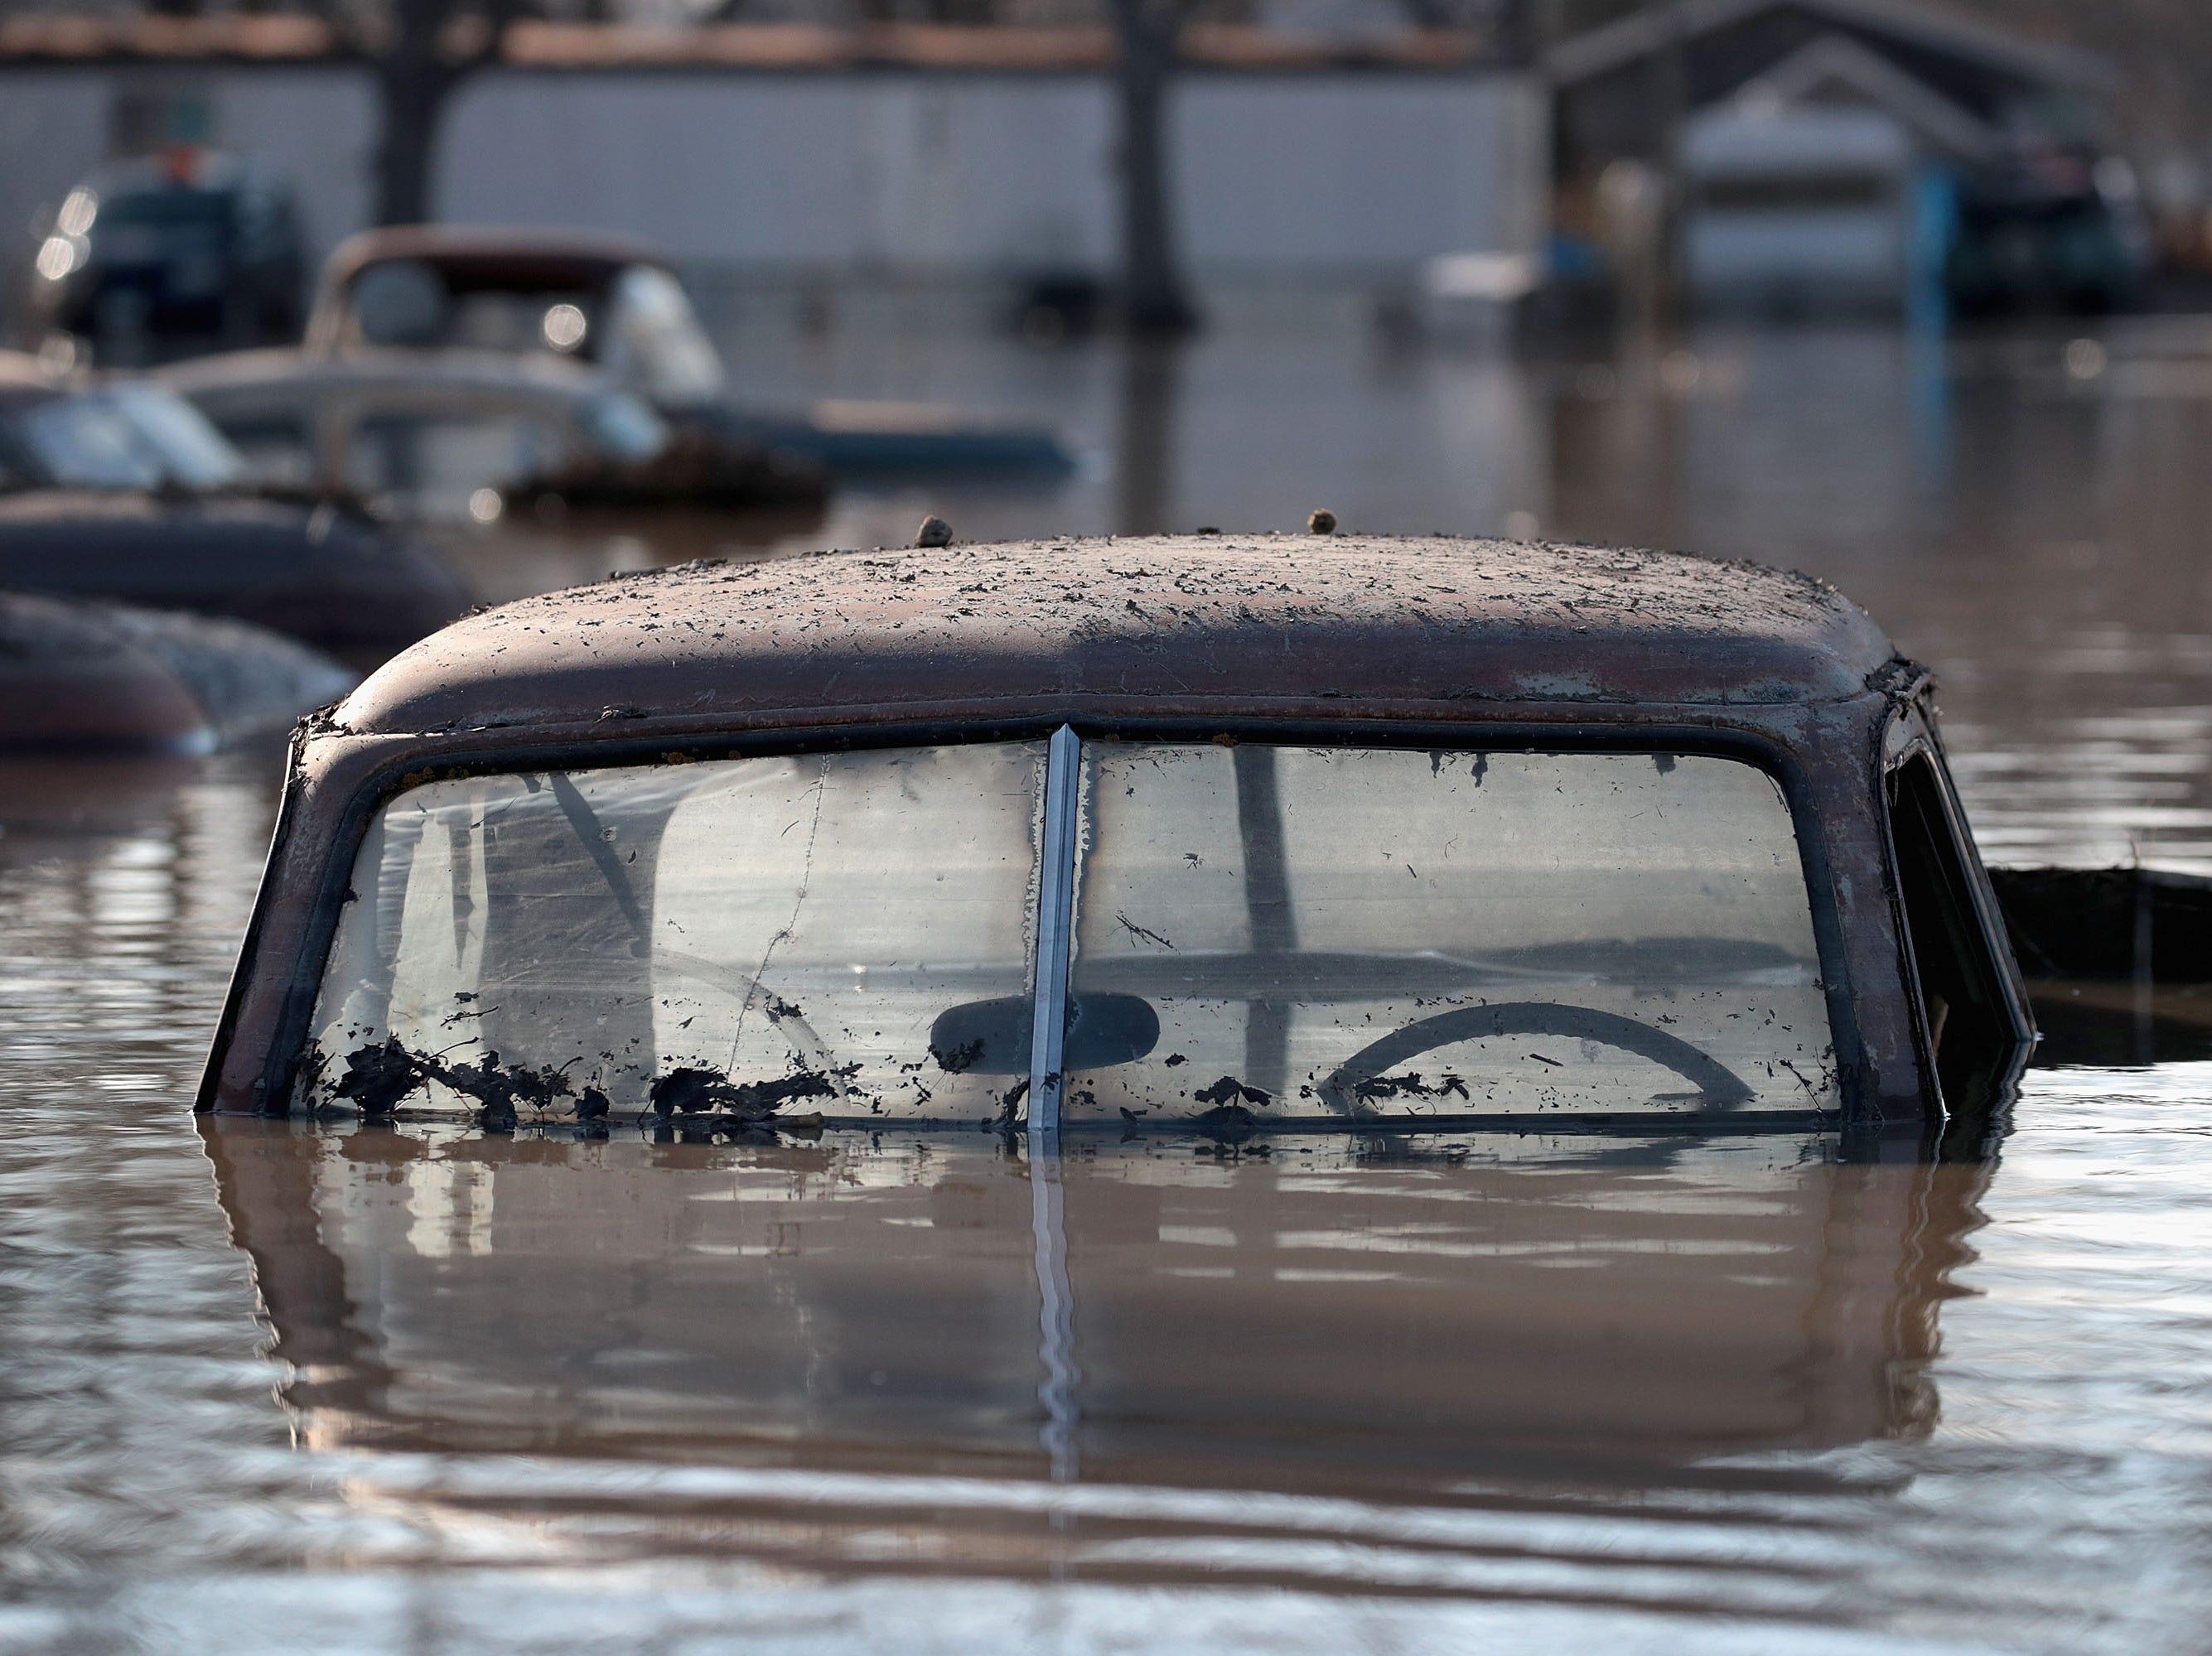 A vintage car sits in flood water on March 20, 2019 in Hamburg, Iowa.